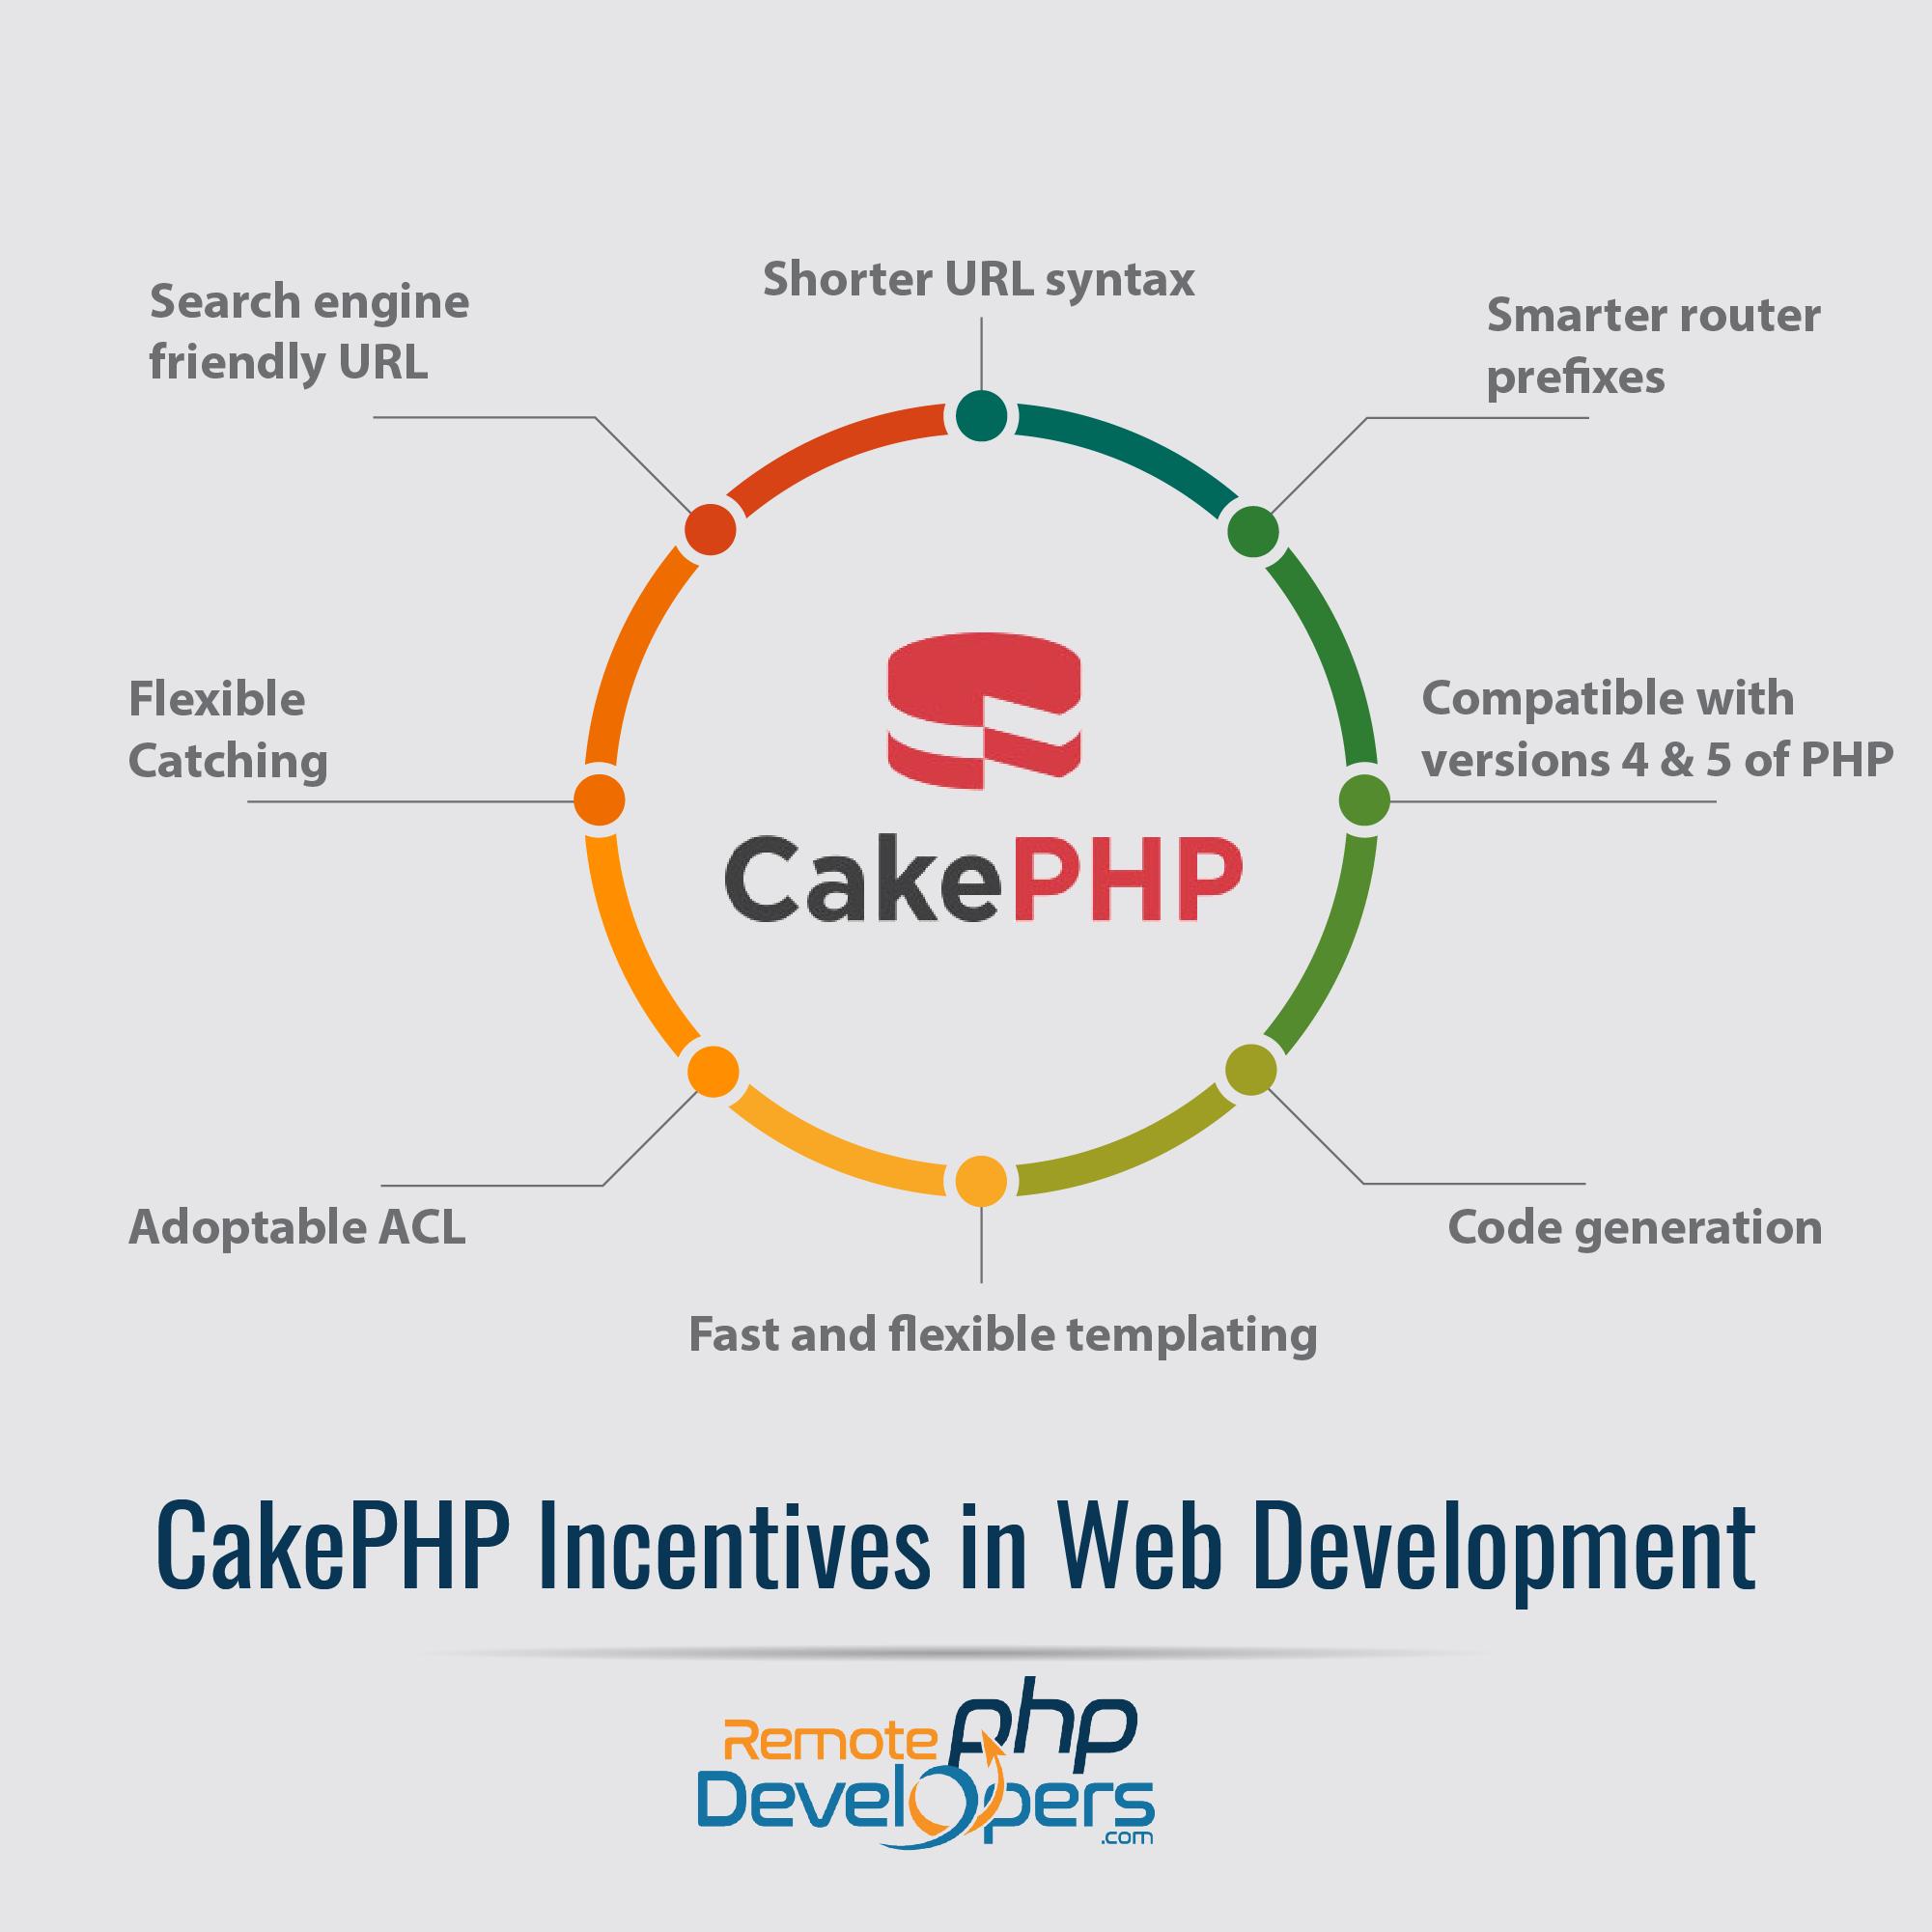 Hire Cakephp Developer For Robust Web Development Services Web Development Development Web Application